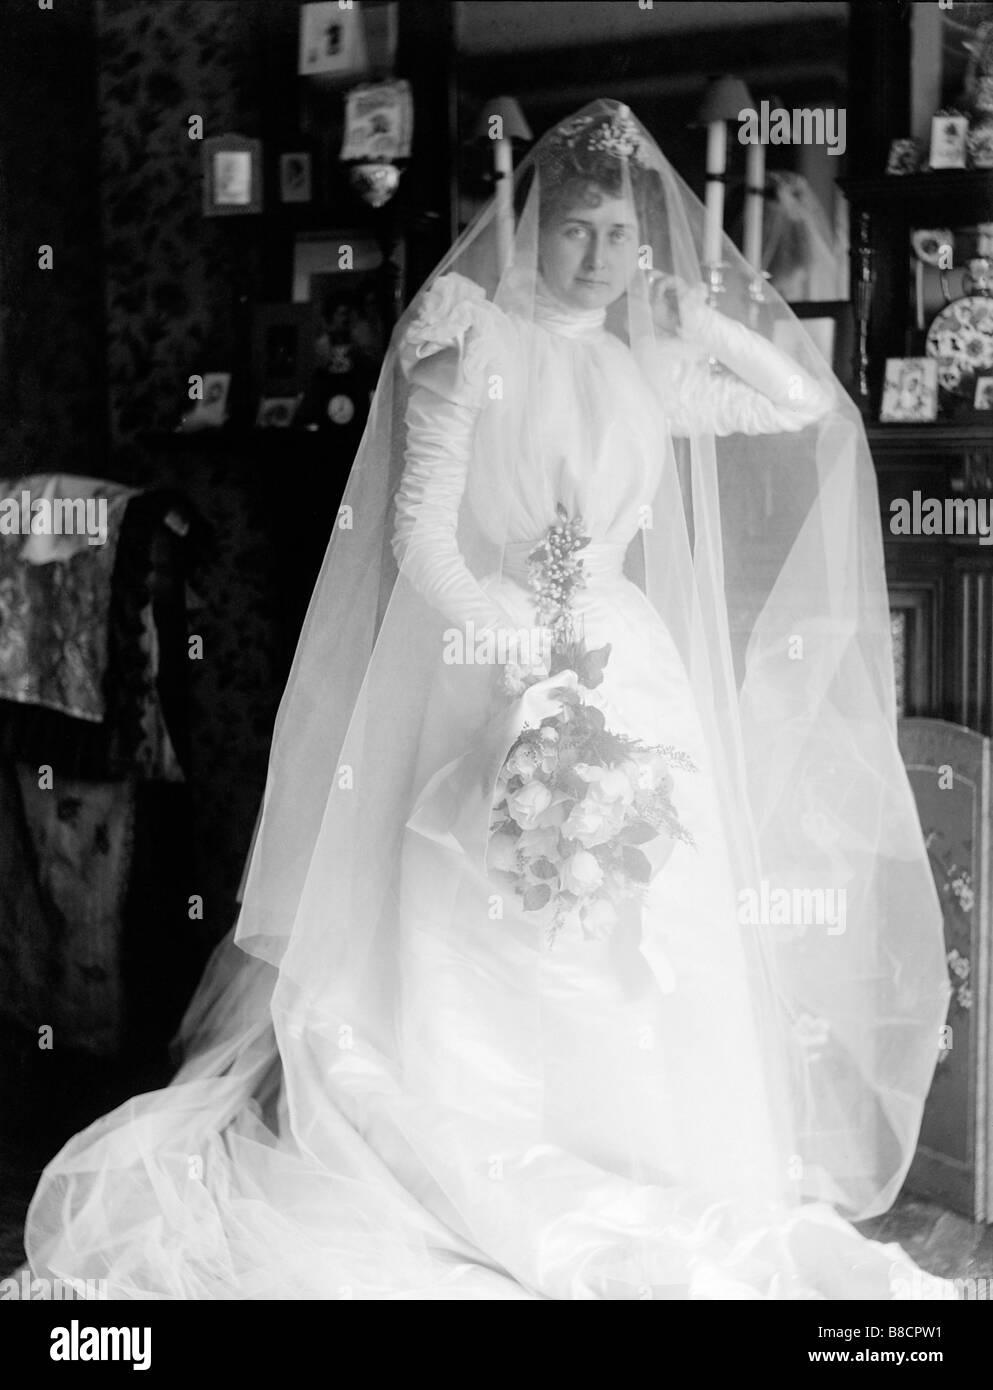 s woman wedding dress Victorian Woman Wedding Dress Montreal Quebec circa s Stock Image